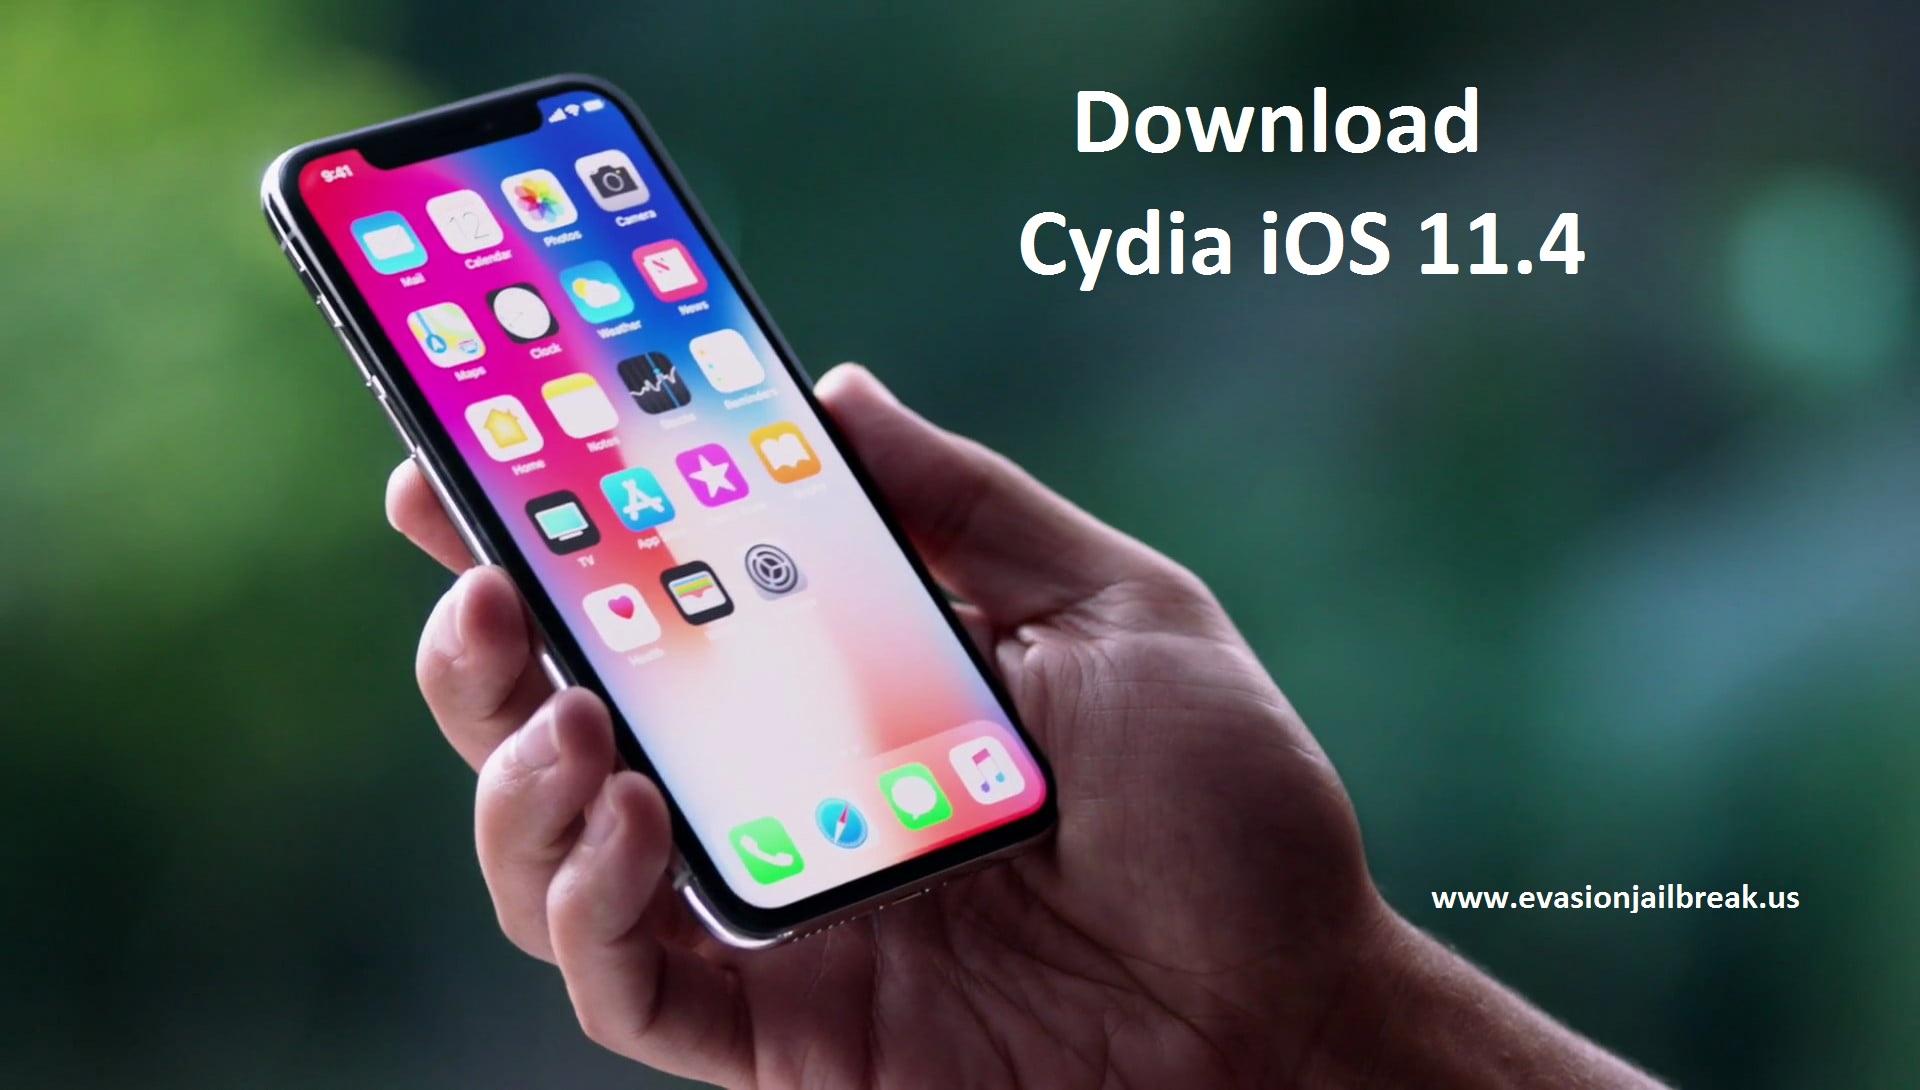 cydia ios 11.4